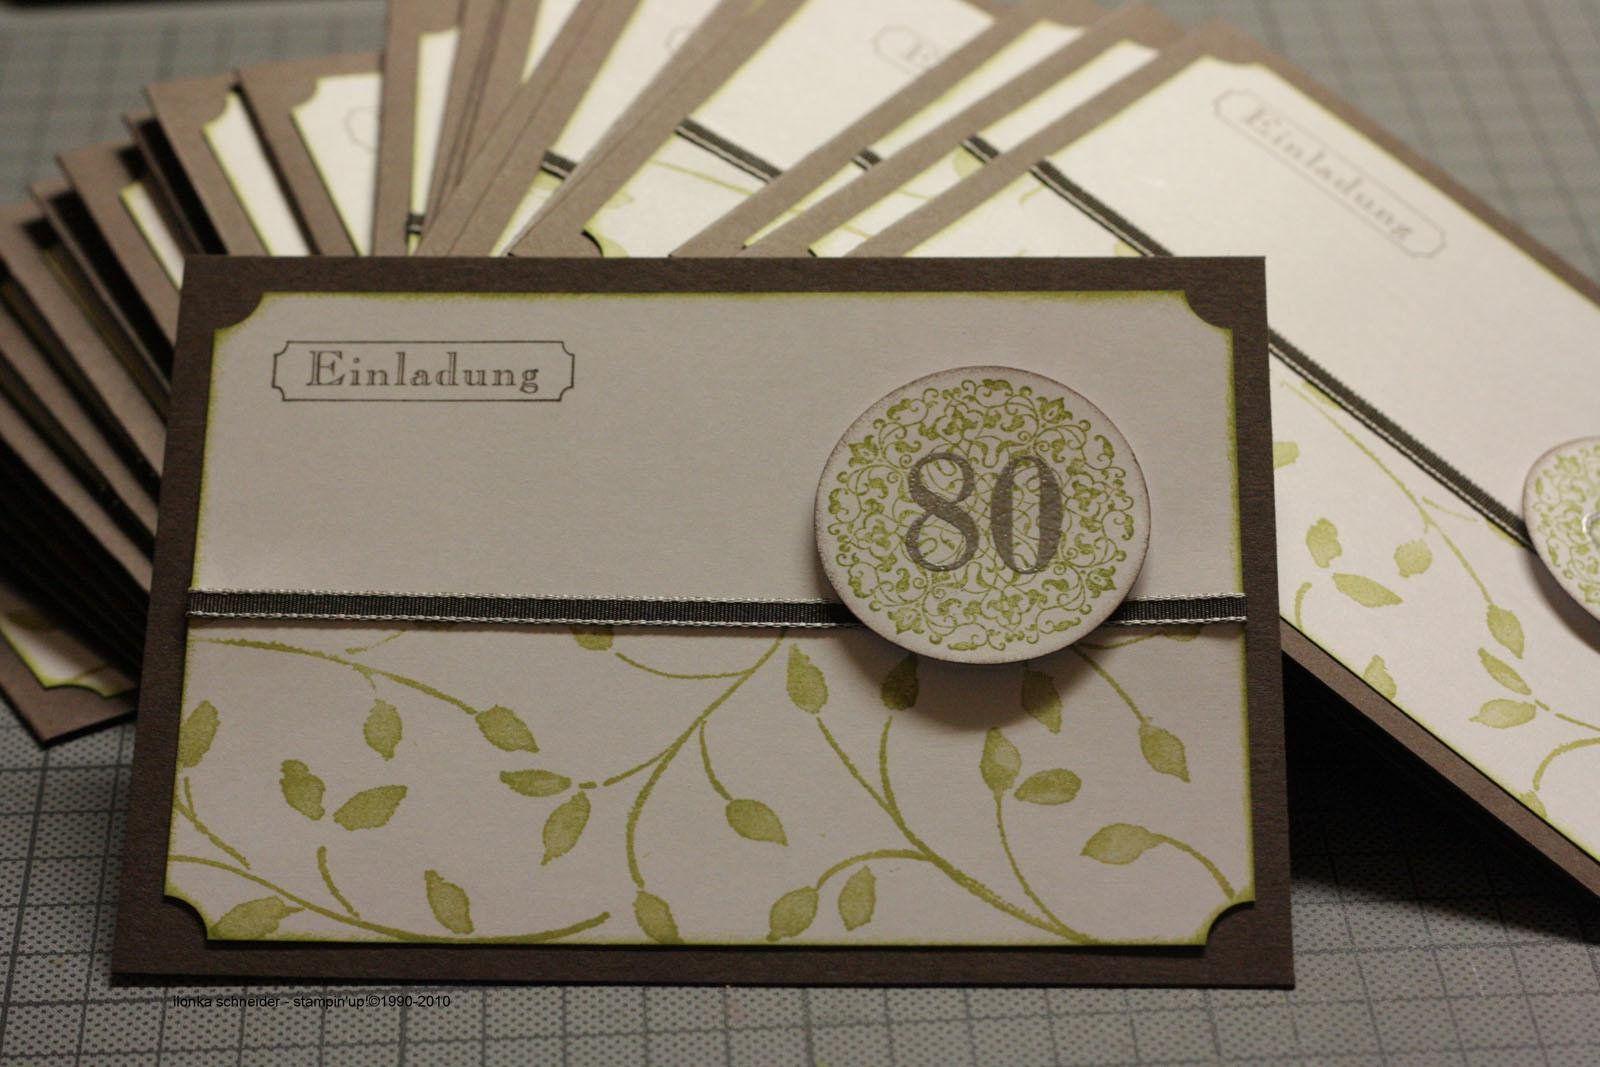 Einladung 80 Geburtstag Einladung 80 Geburtstag Einladung